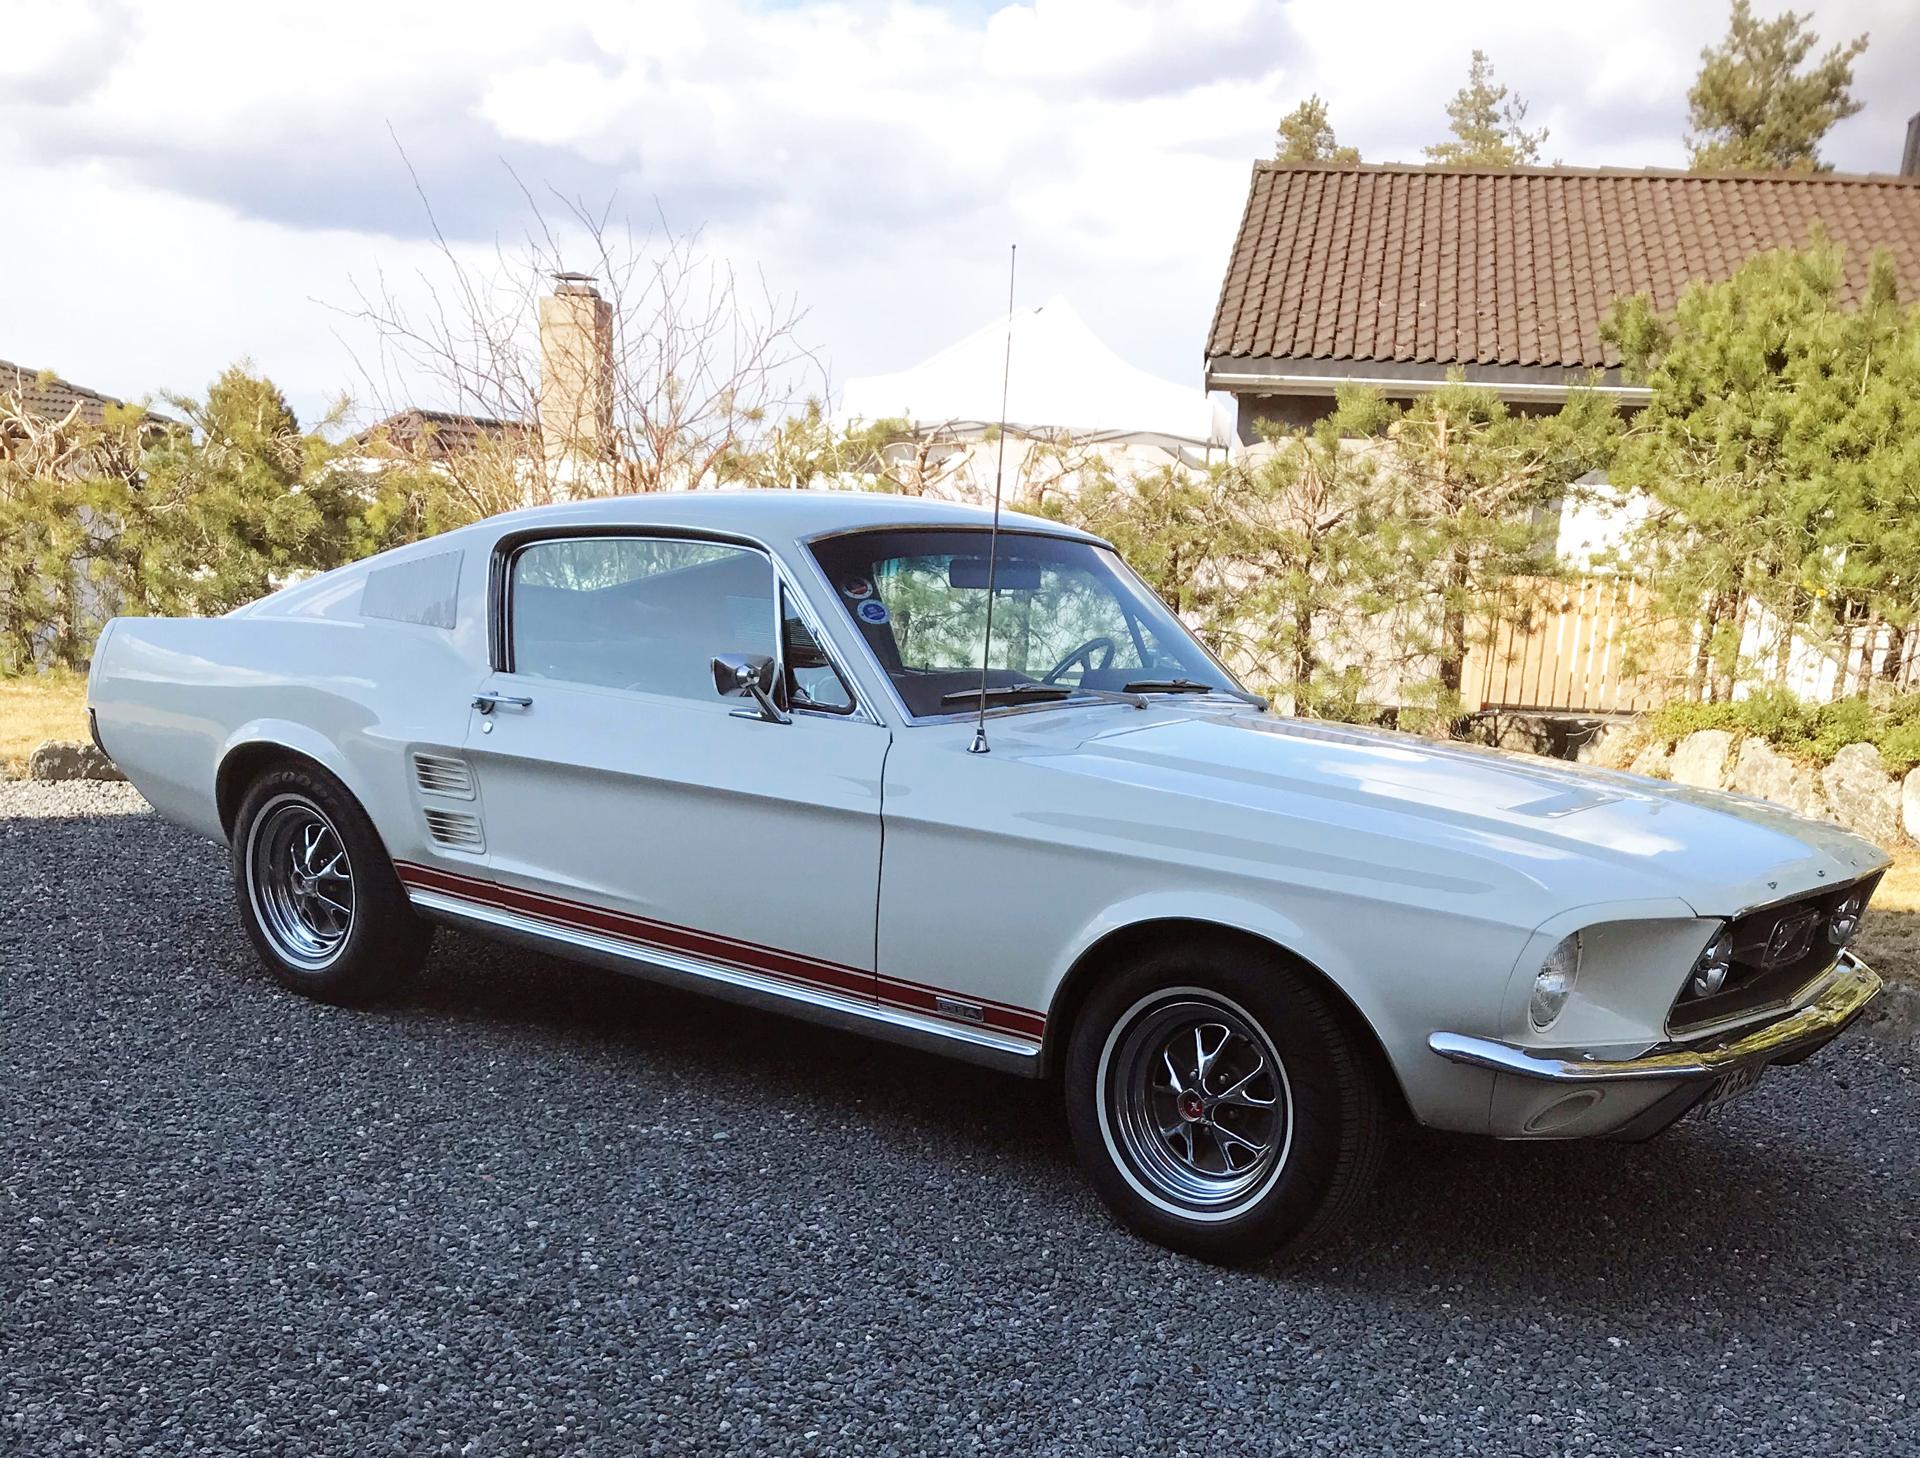 236-1967 Ford Mustang S code med GTA options 01. E